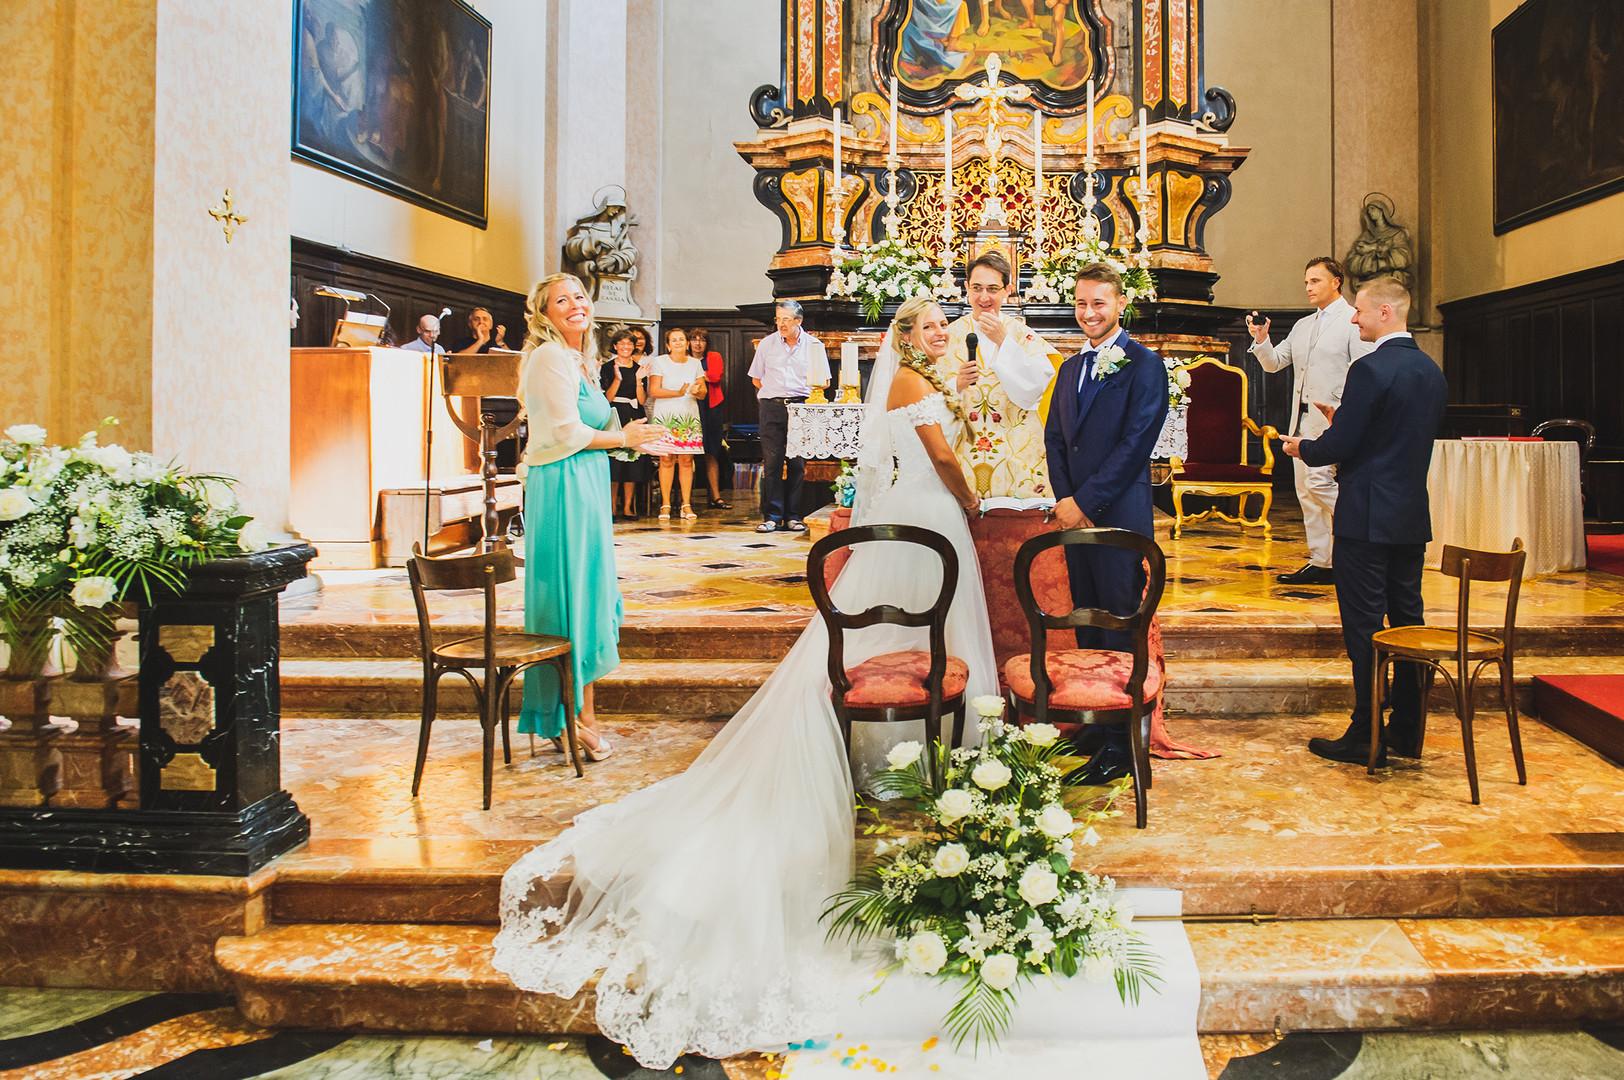 2019.08.24_Matrimonio_Nicole_Davide_0058